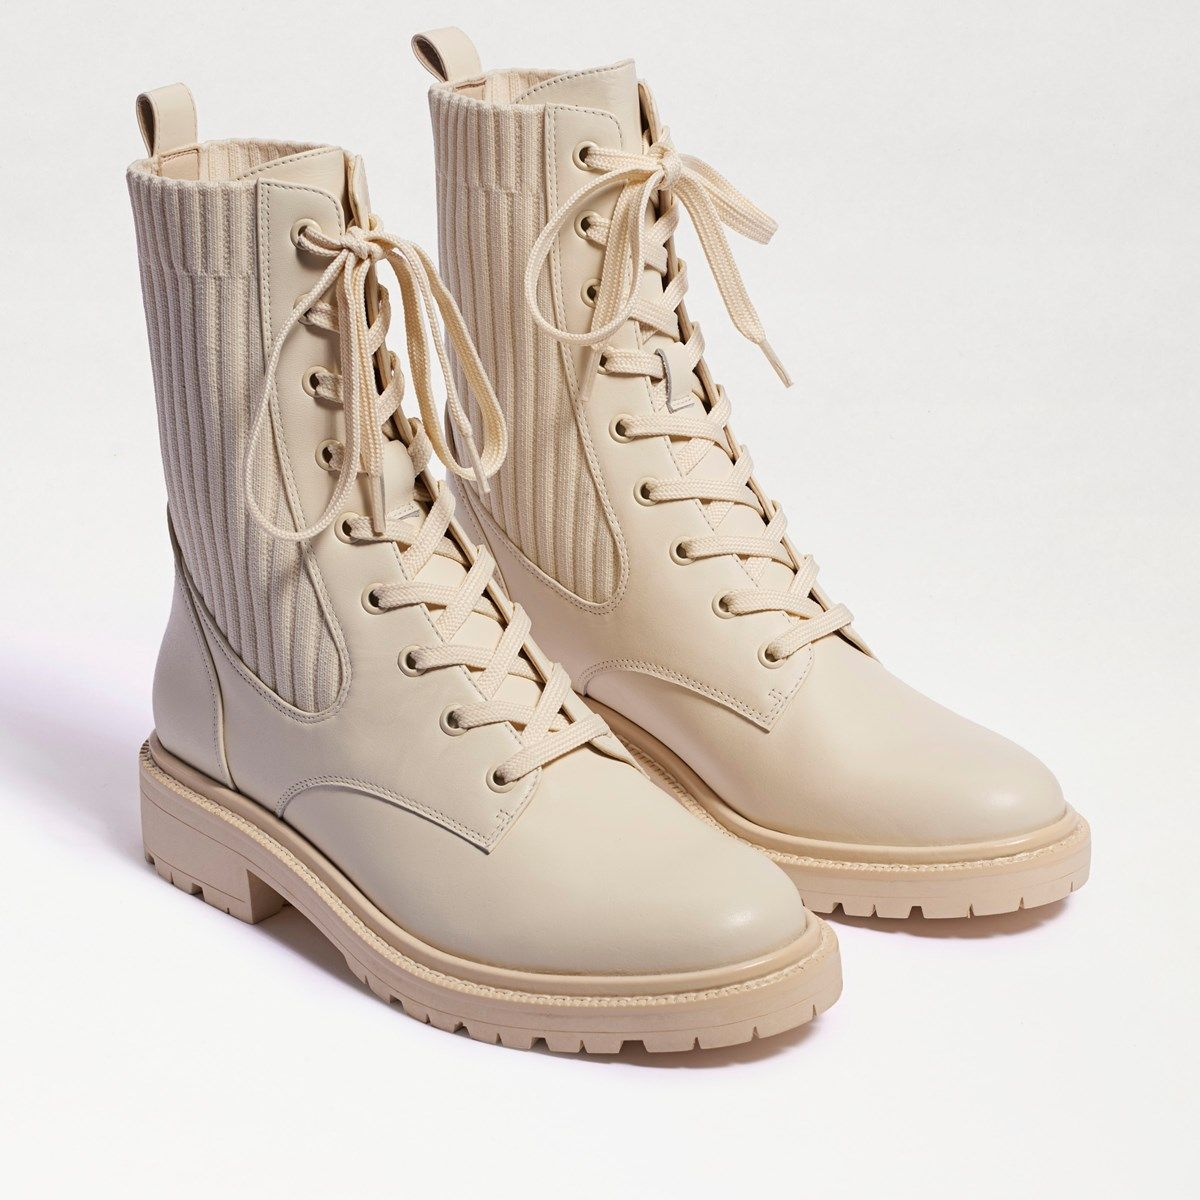 14+ Sam edelman combat boots ideas ideas